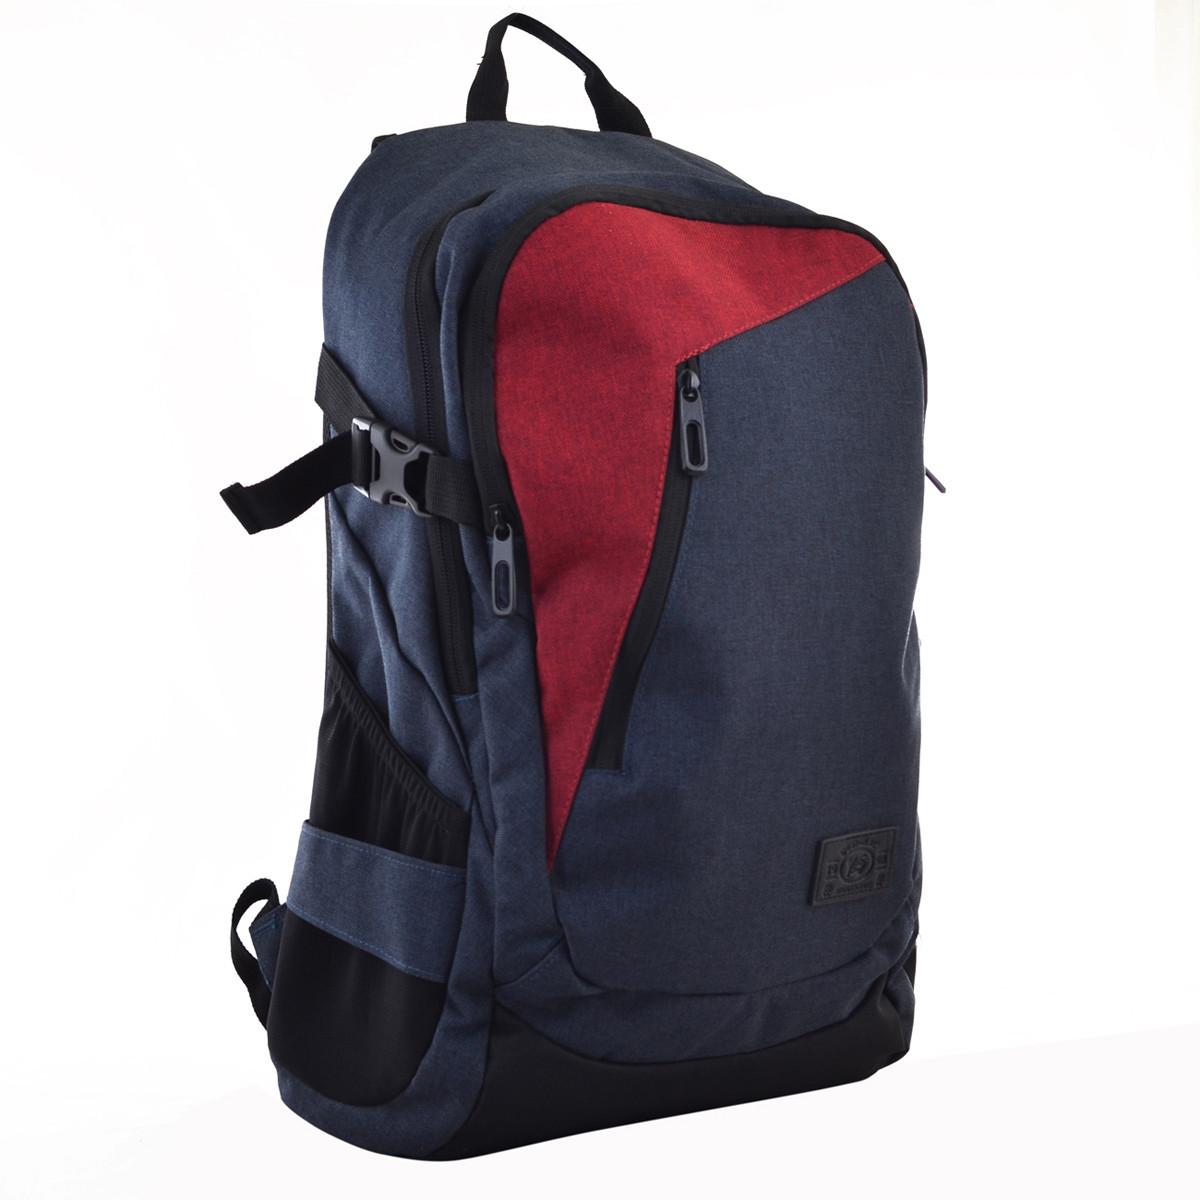 Рюкзак подростковый YES USB Harry, 43*29*9 555466